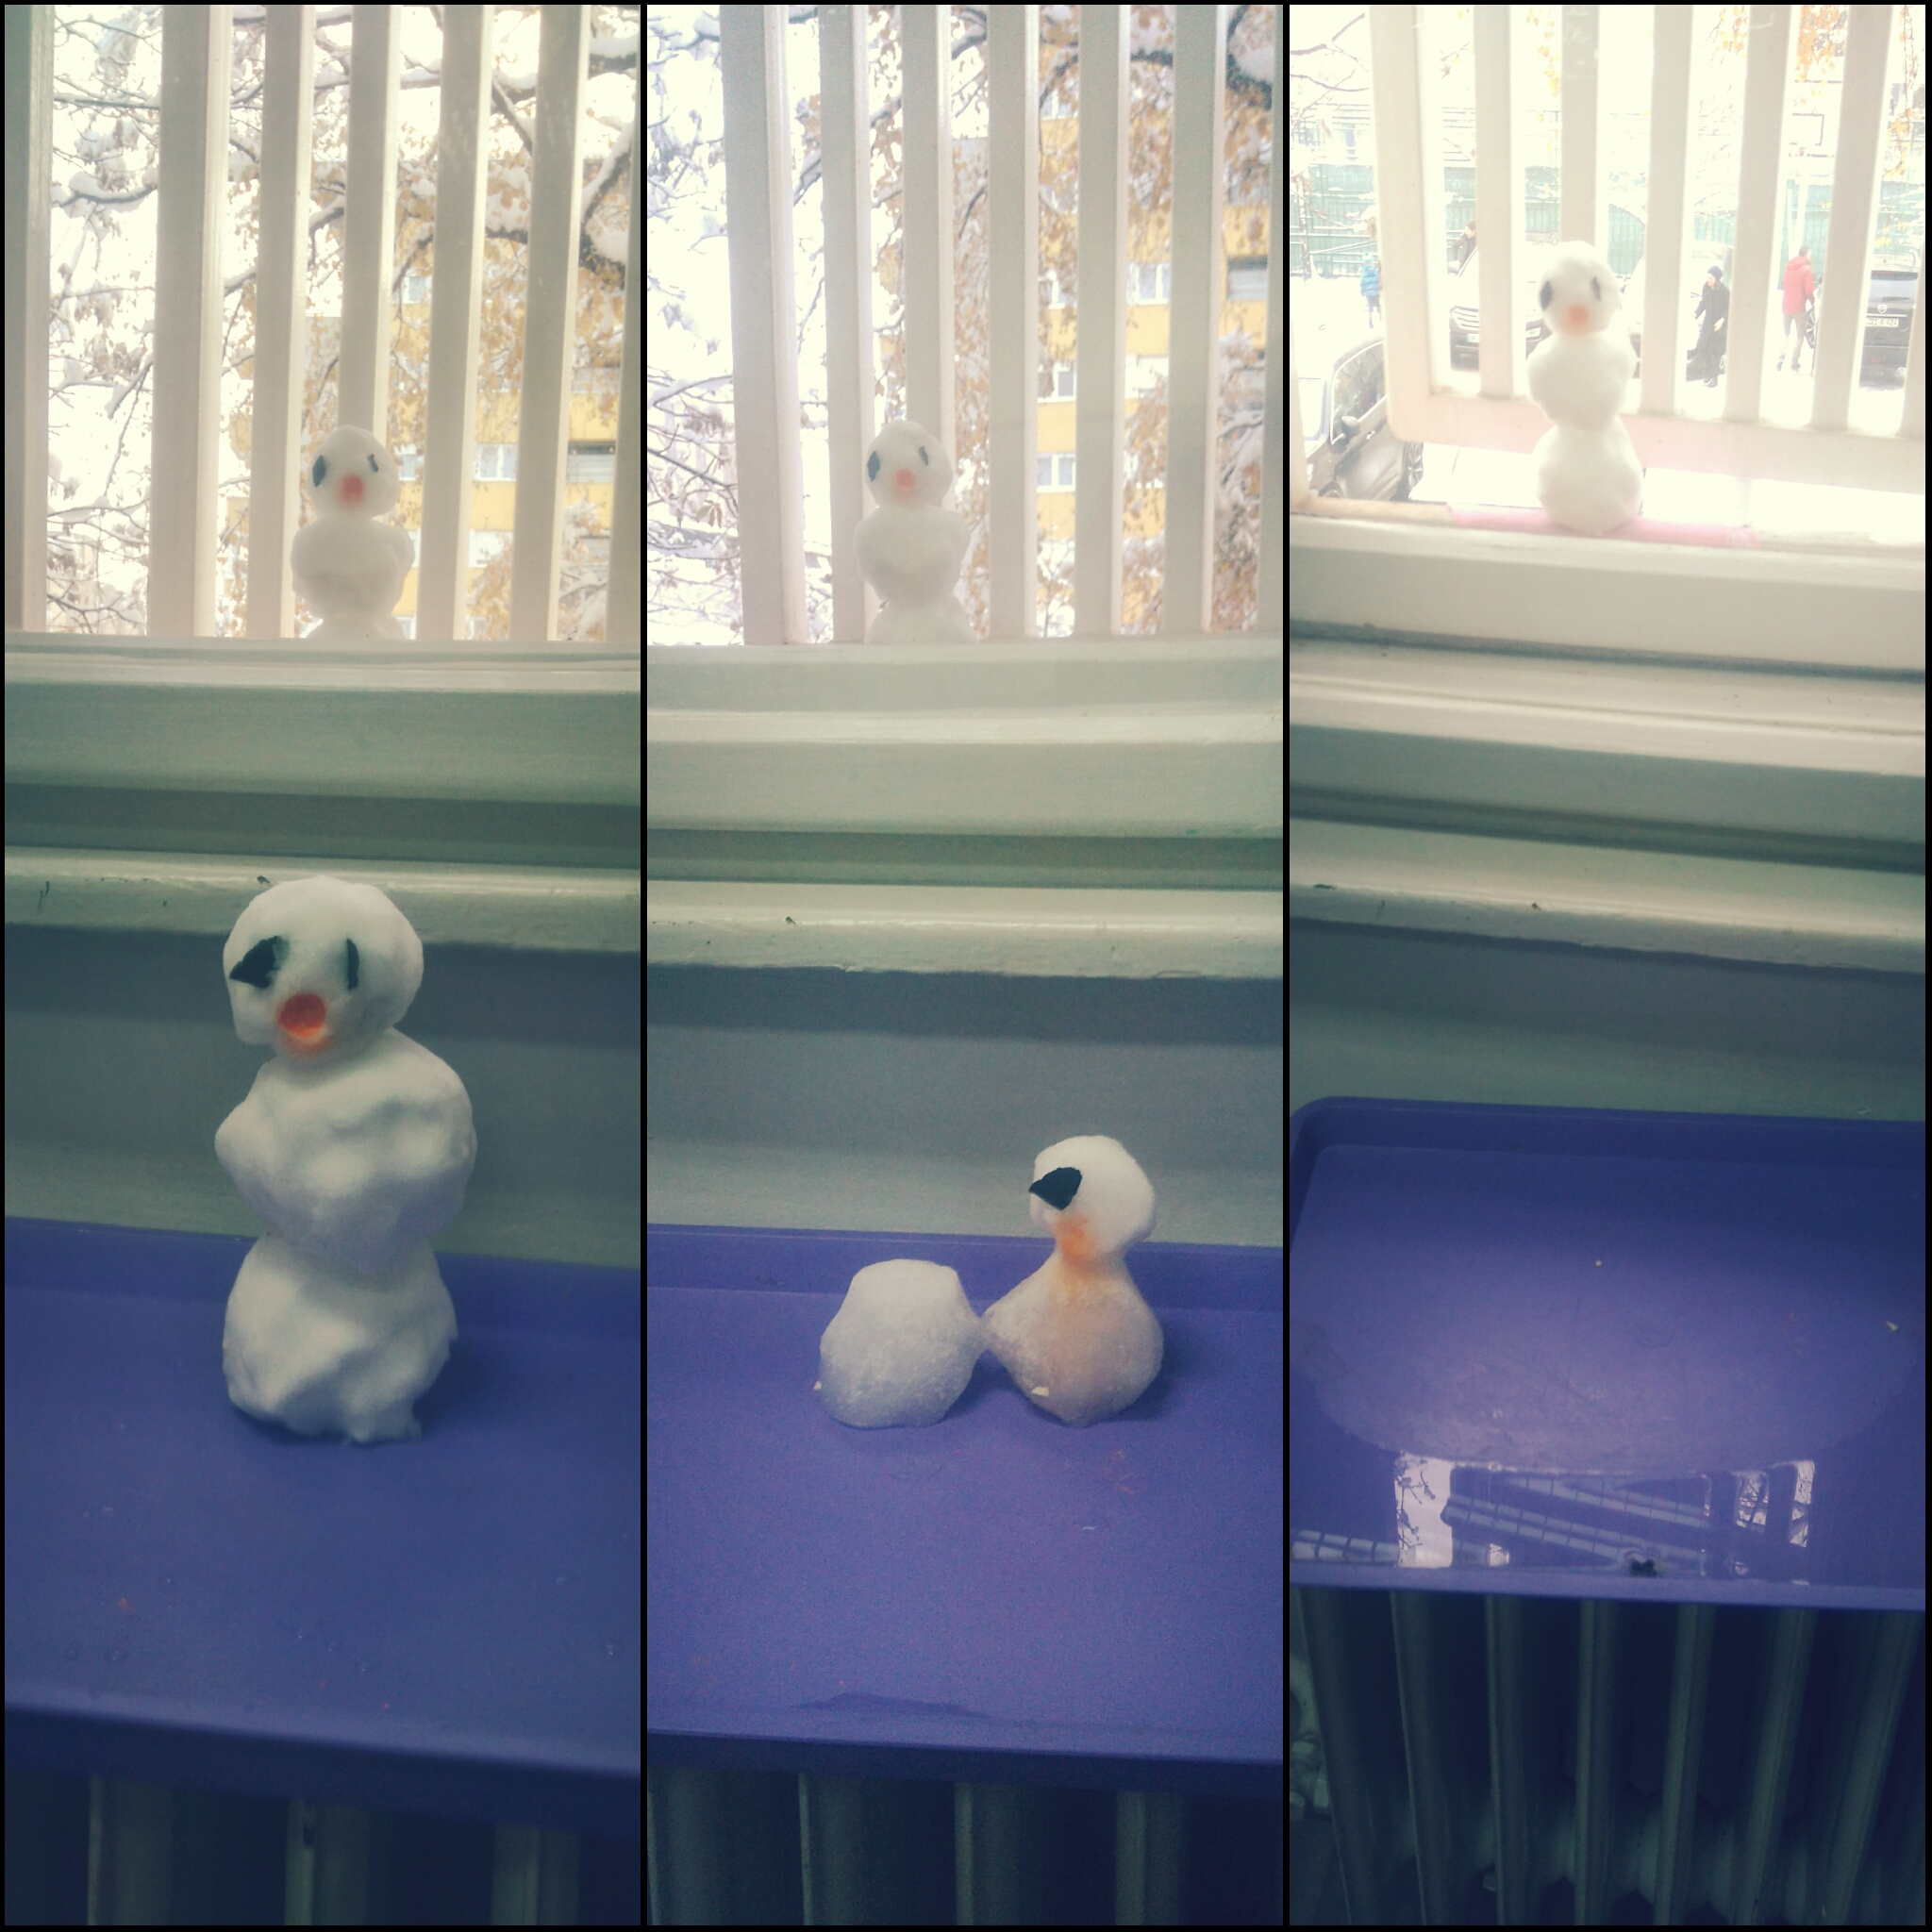 One snowman